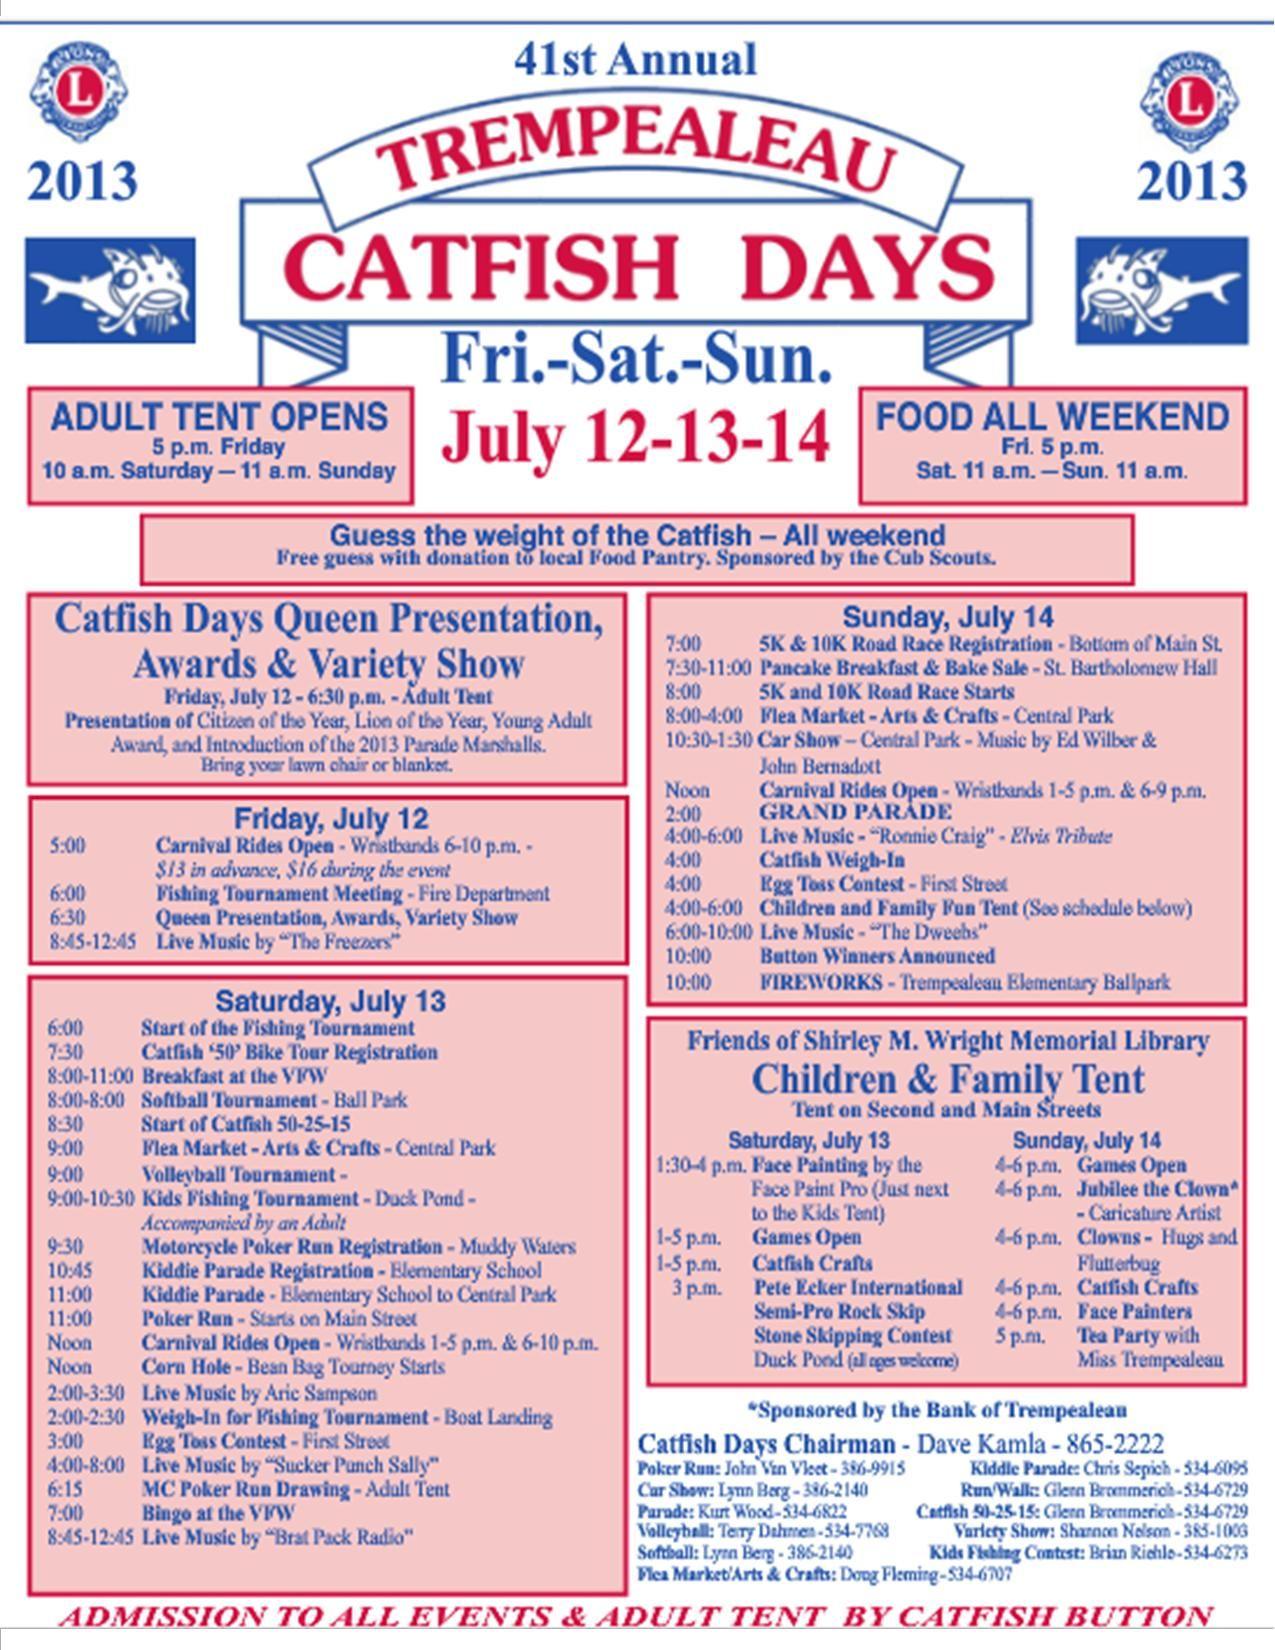 Catfish days july 1214 2013 in trempealeau wi day